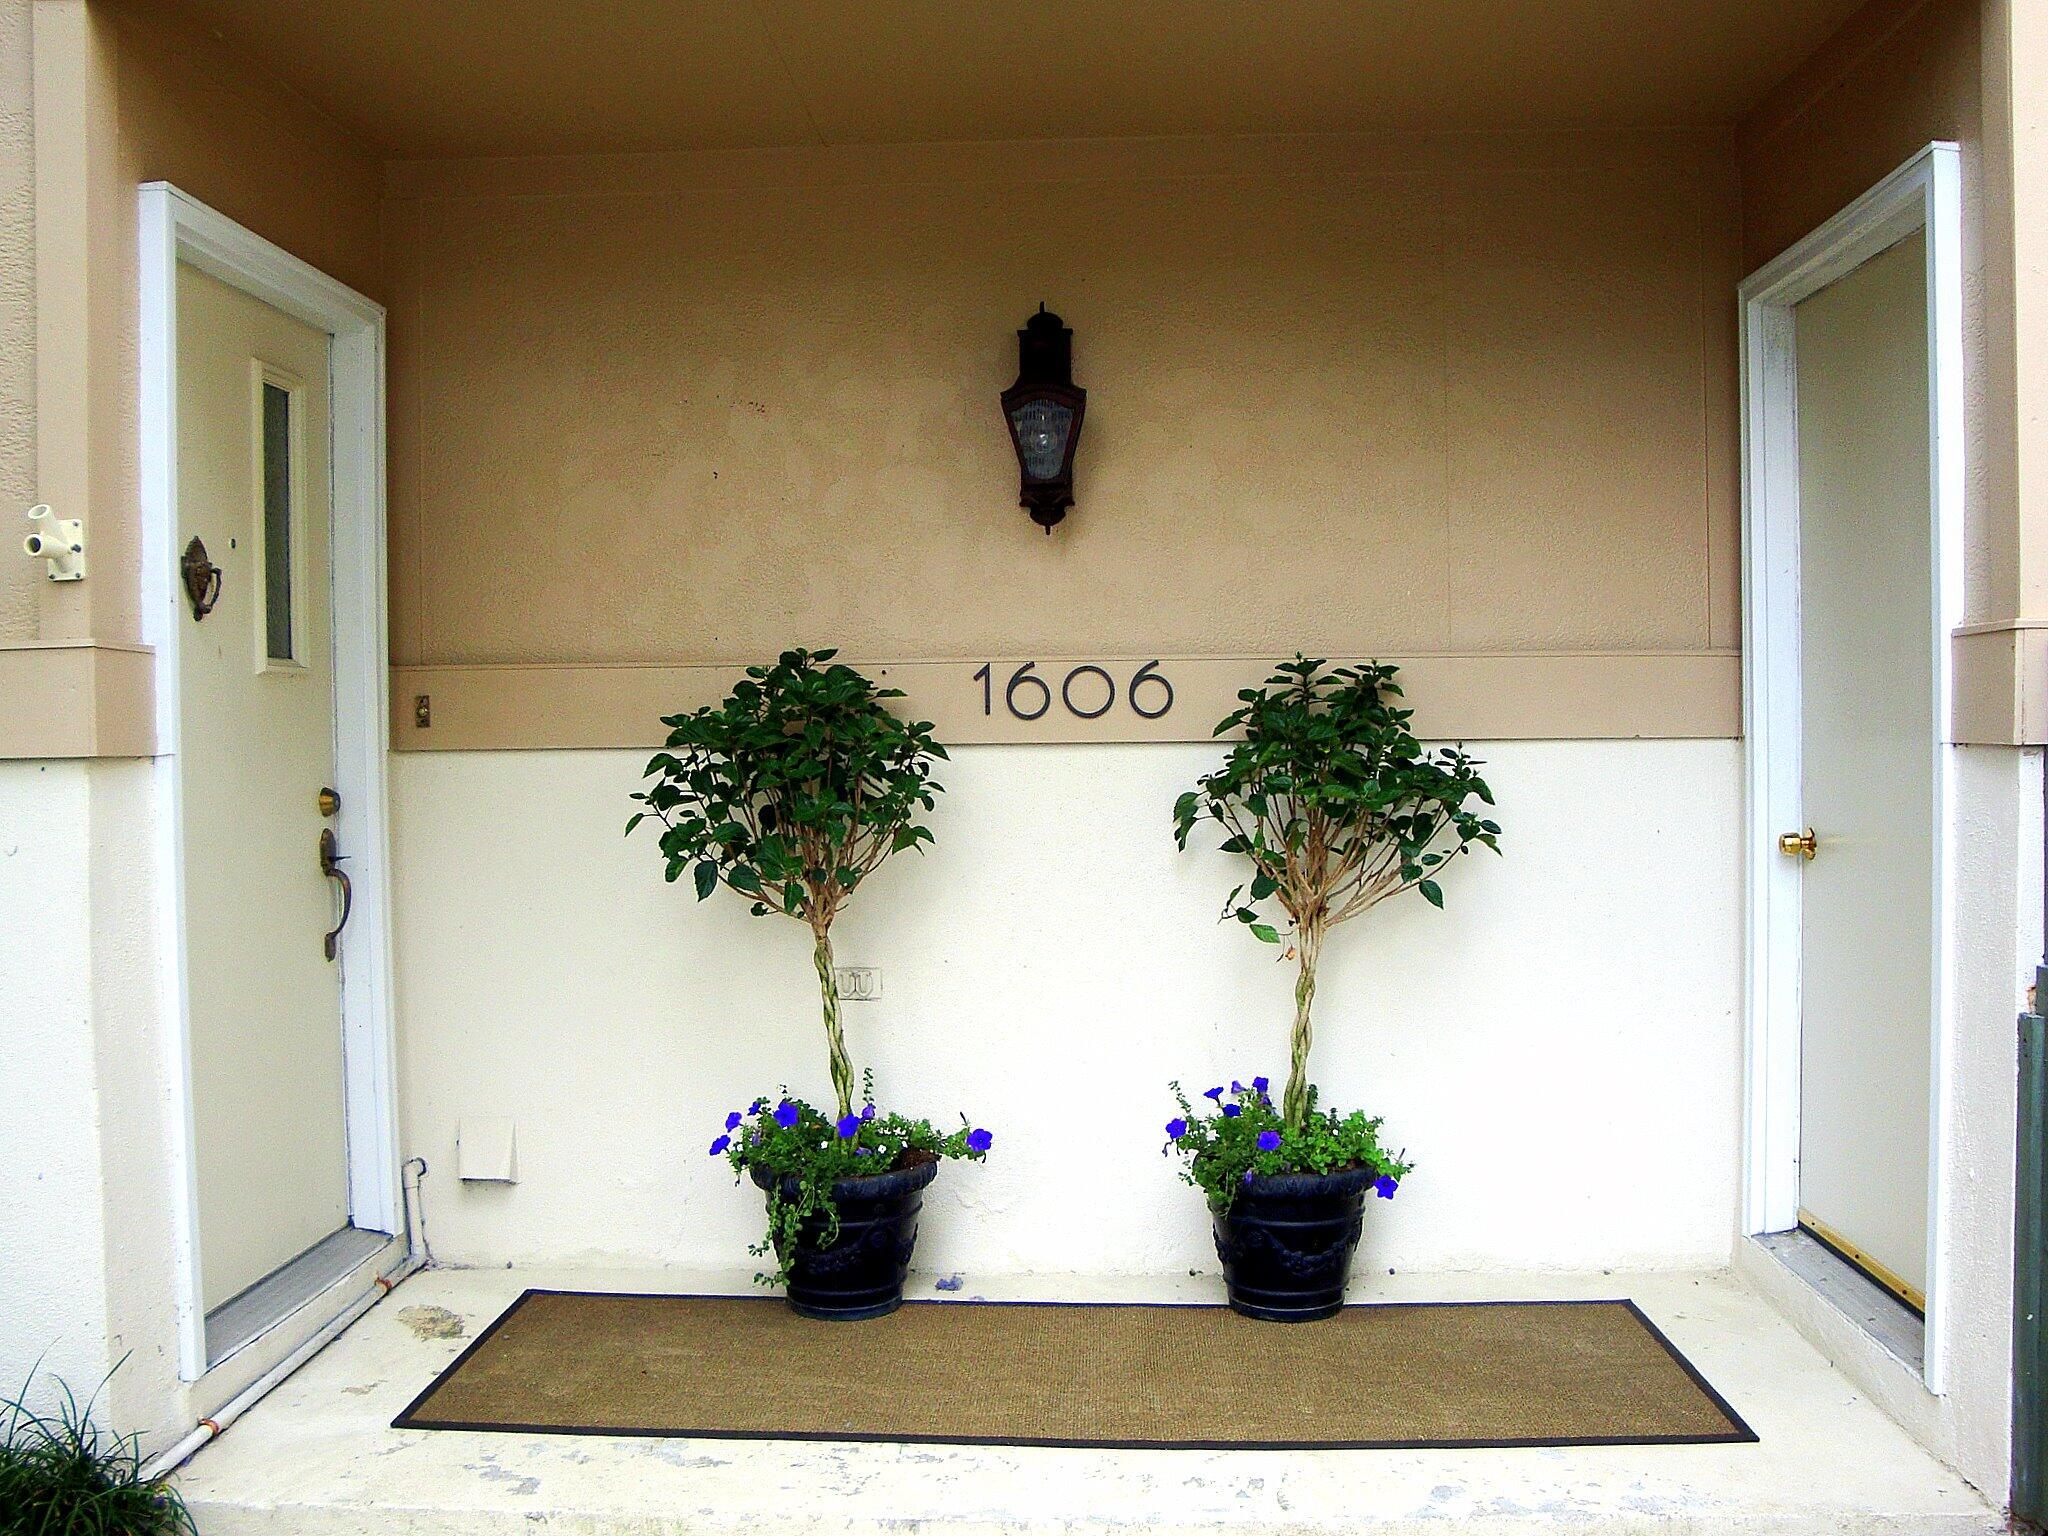 Snee Farm Homes For Sale - 1606 Ventura, Mount Pleasant, SC - 1